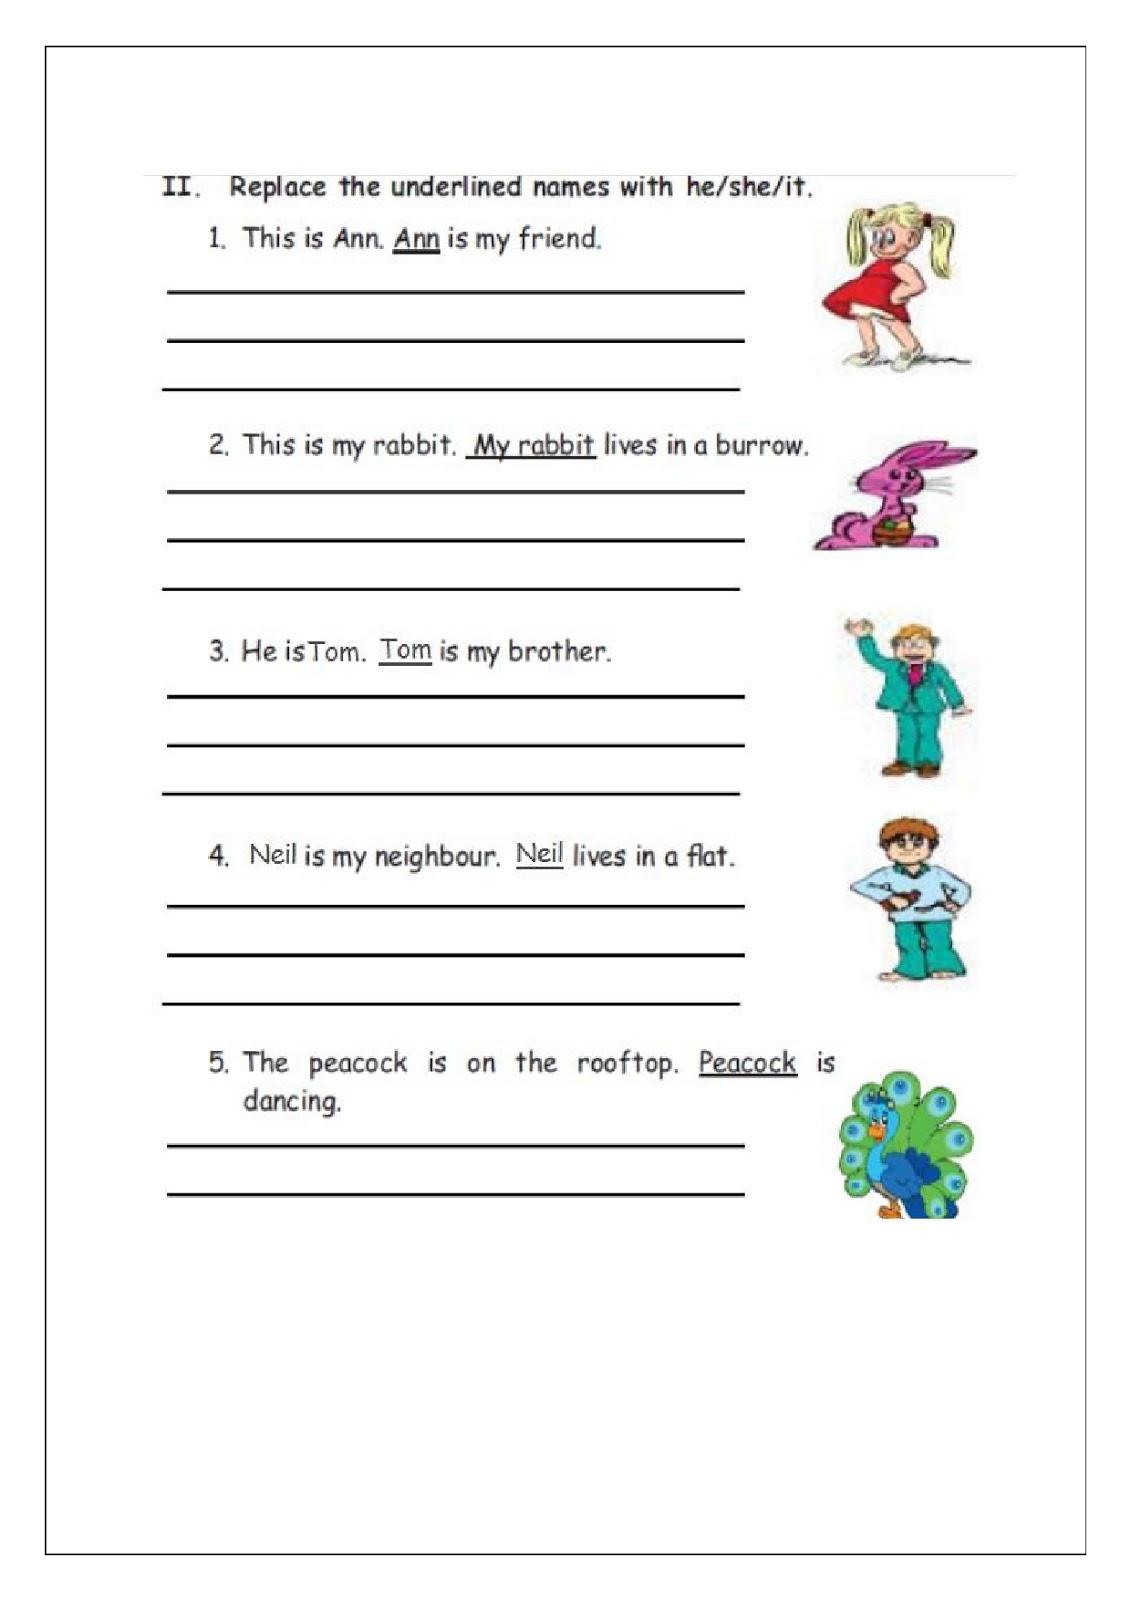 Birla World School Oman Homework For Grade 1b On 1 12 15